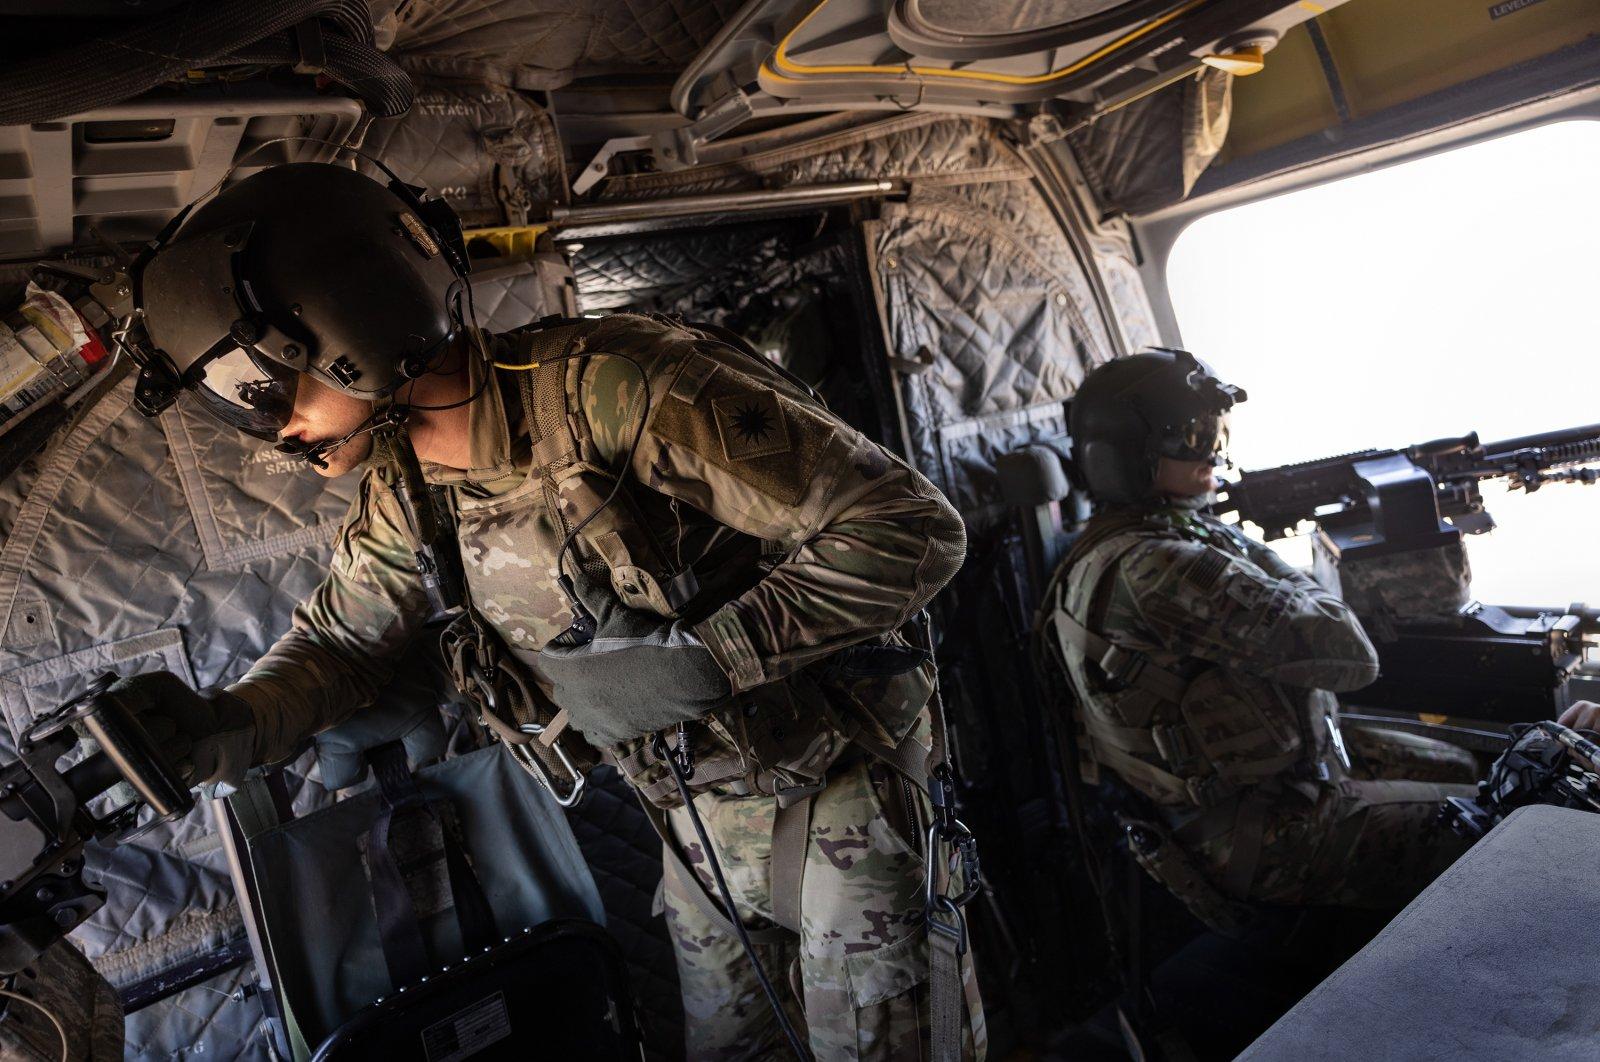 Despite Turkey's concerns, US provides $2B support to YPG terrorists